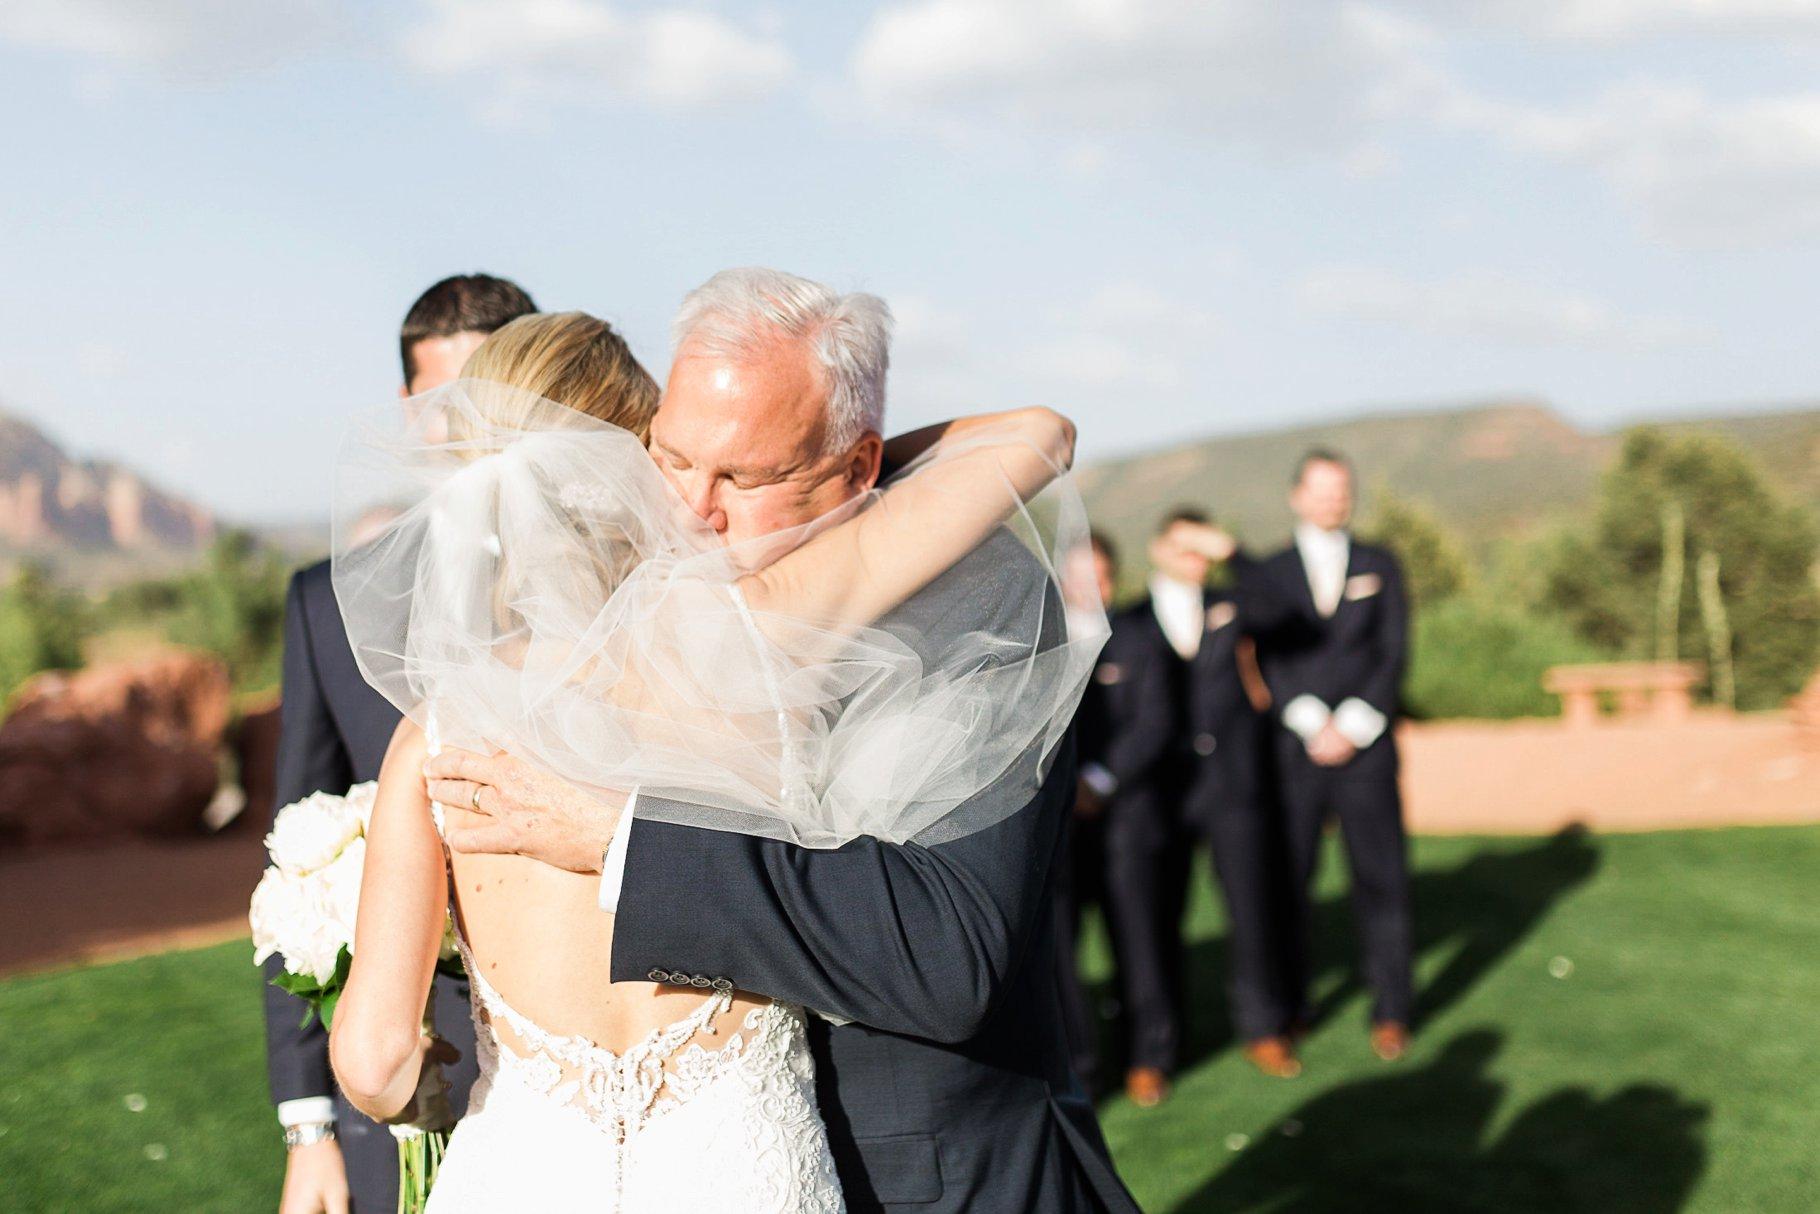 sedona wedding-70_GRETCHEN WAKEMAN PHOTOGRAPHY.jpg